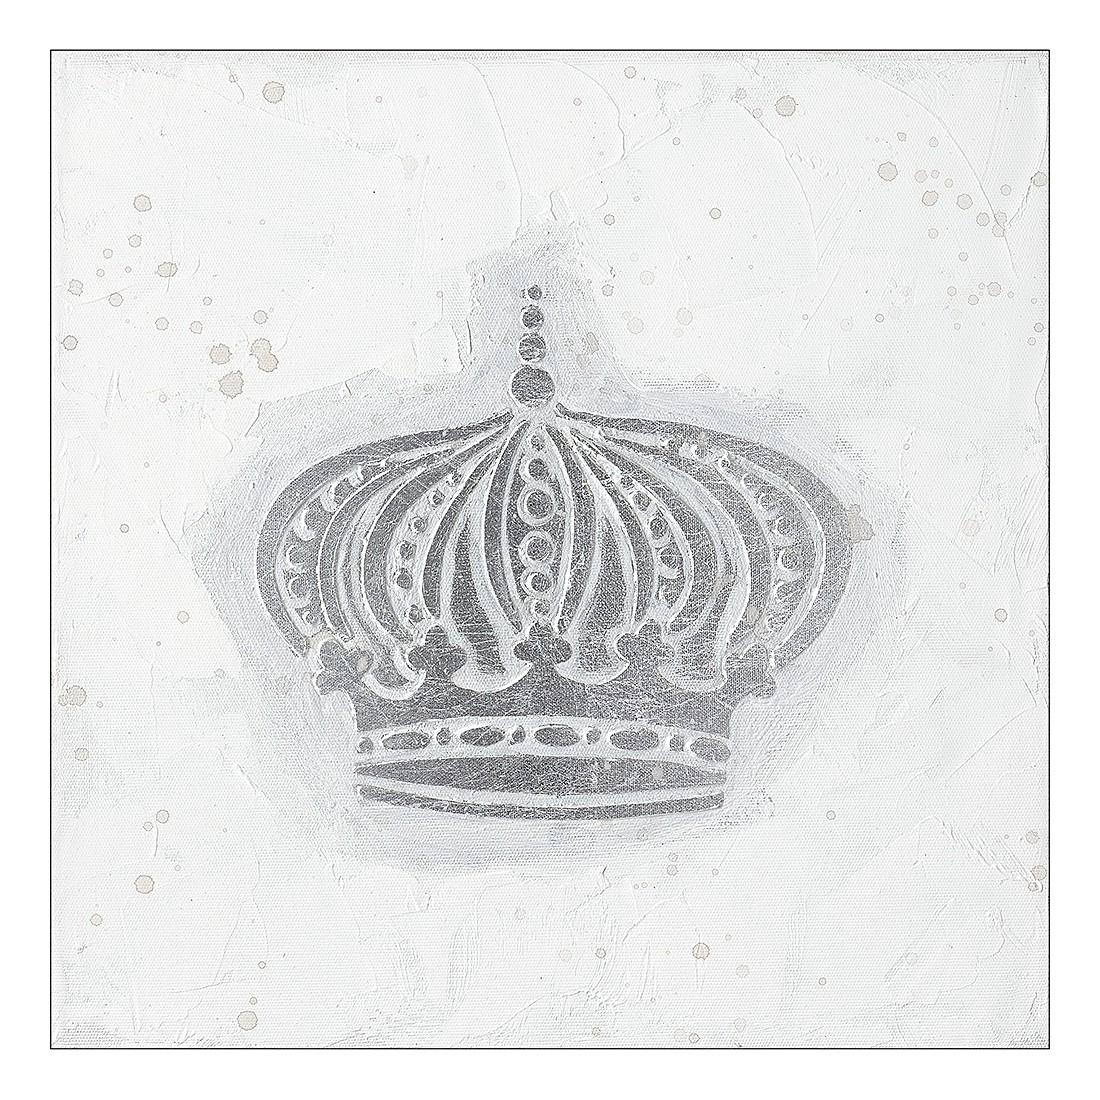 Leinwand Krone, Pro Art